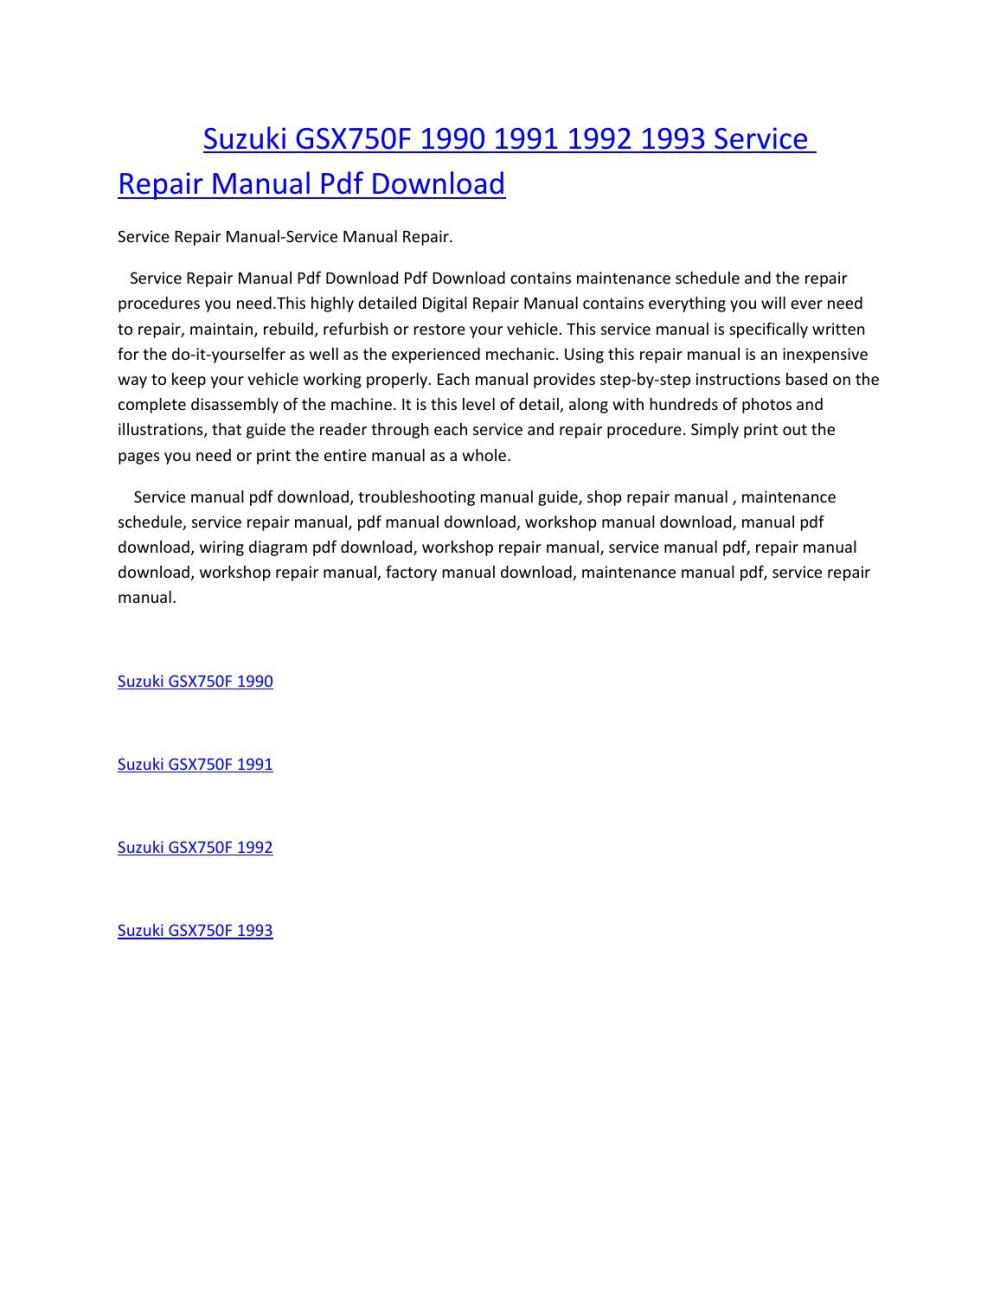 medium resolution of suzuki gsx750f 1990 1991 1992 1993 service manual repair pdf download